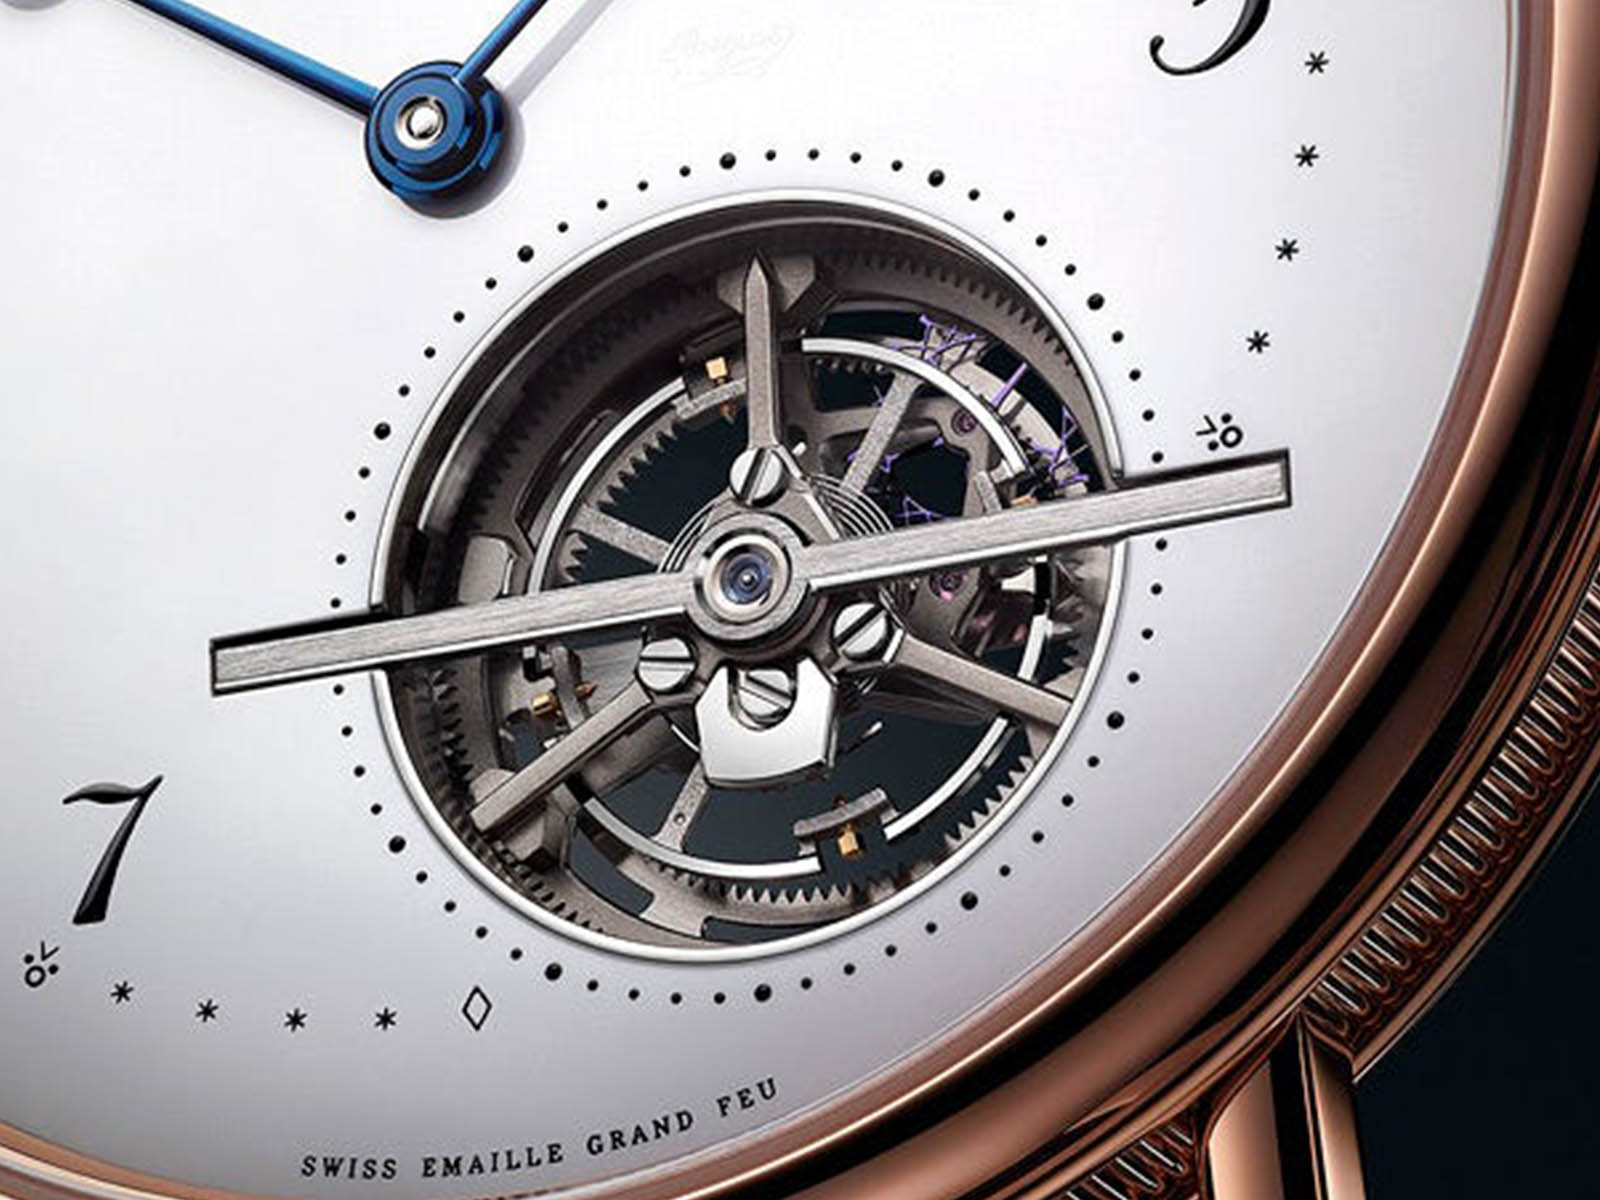 Breguet-Classique-Tourbillon-Extra-Plat-Automatic-5367-4.jpg